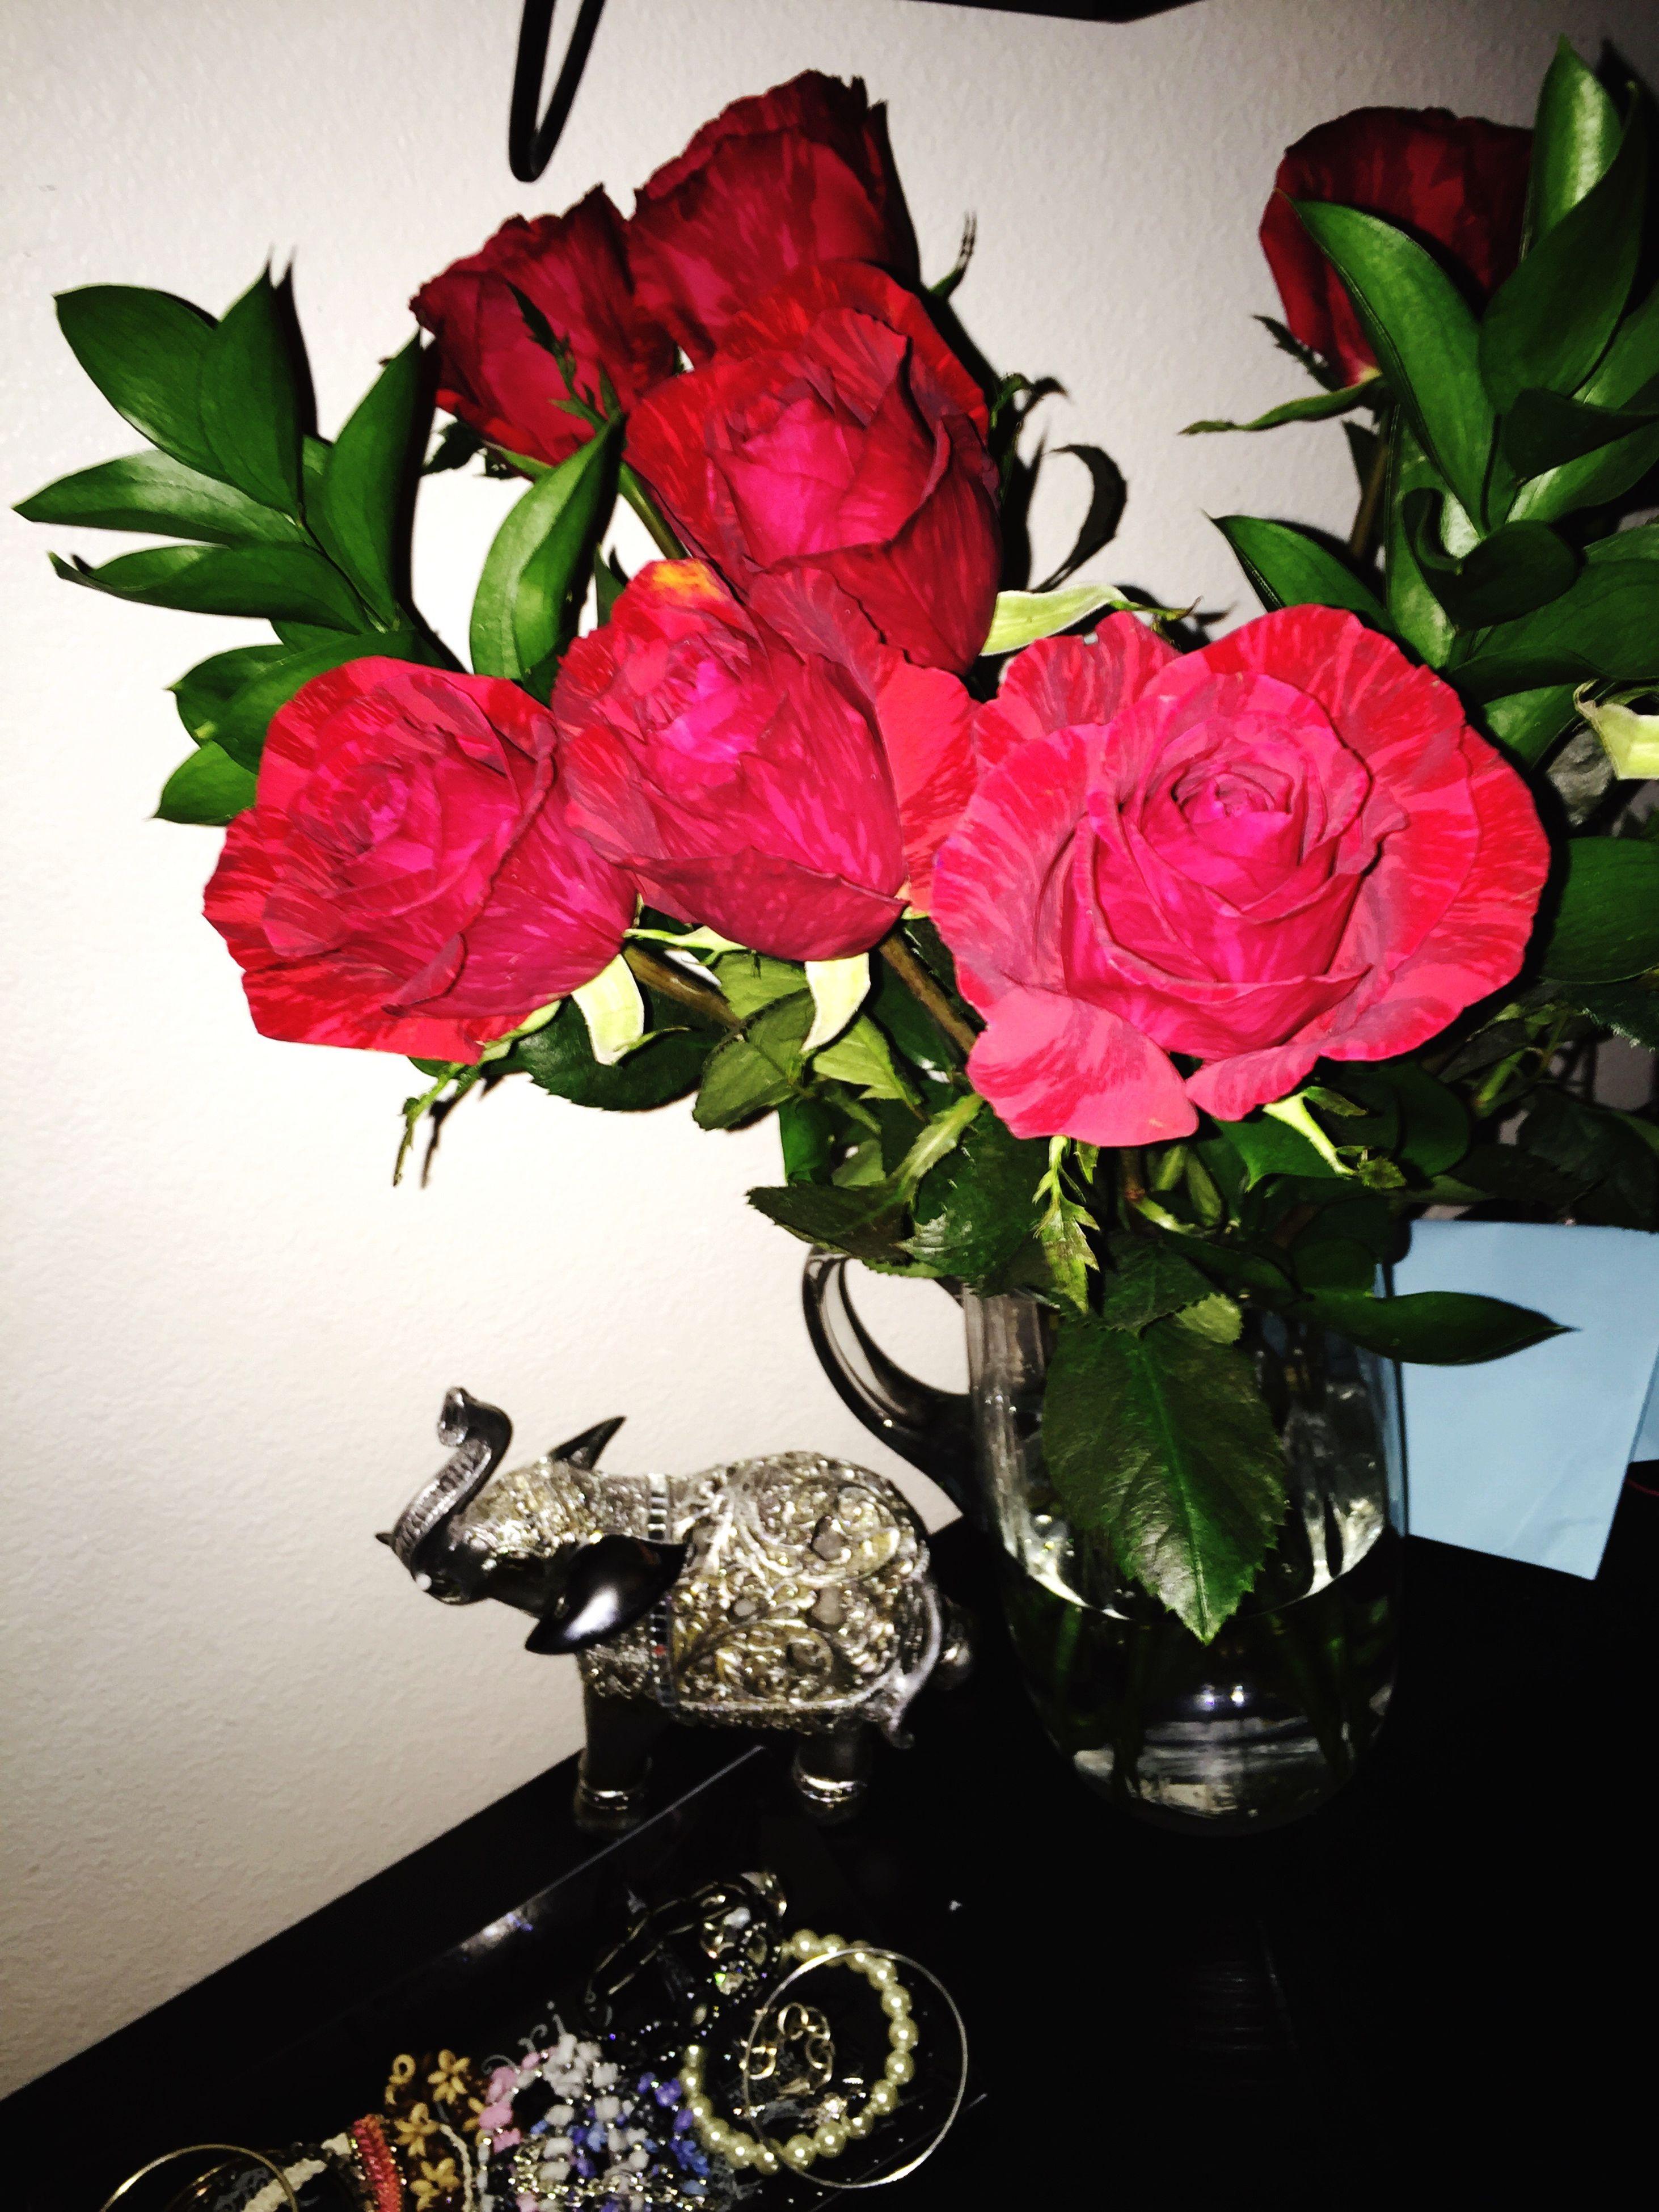 flower, indoors, fragility, freshness, vase, leaf, petal, plant, growth, table, rose - flower, red, flower head, potted plant, decoration, beauty in nature, close-up, nature, flower arrangement, home interior